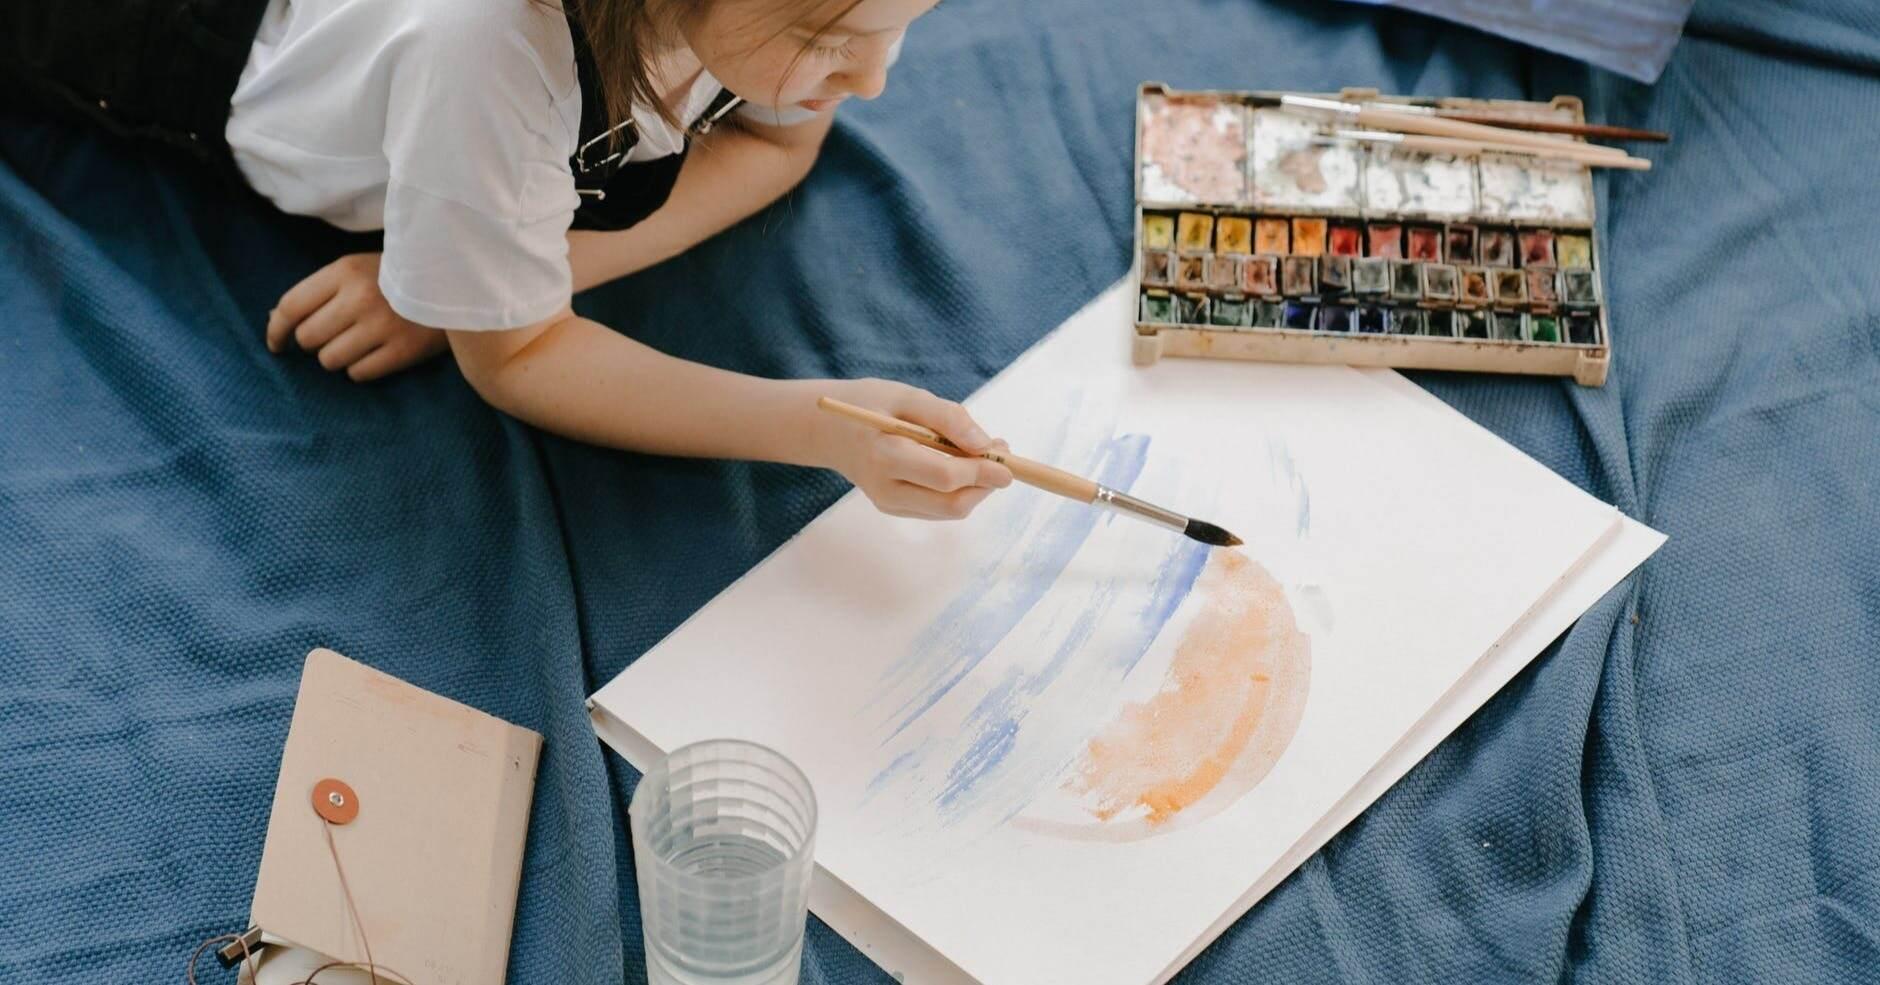 kids artwork saves you some bucks